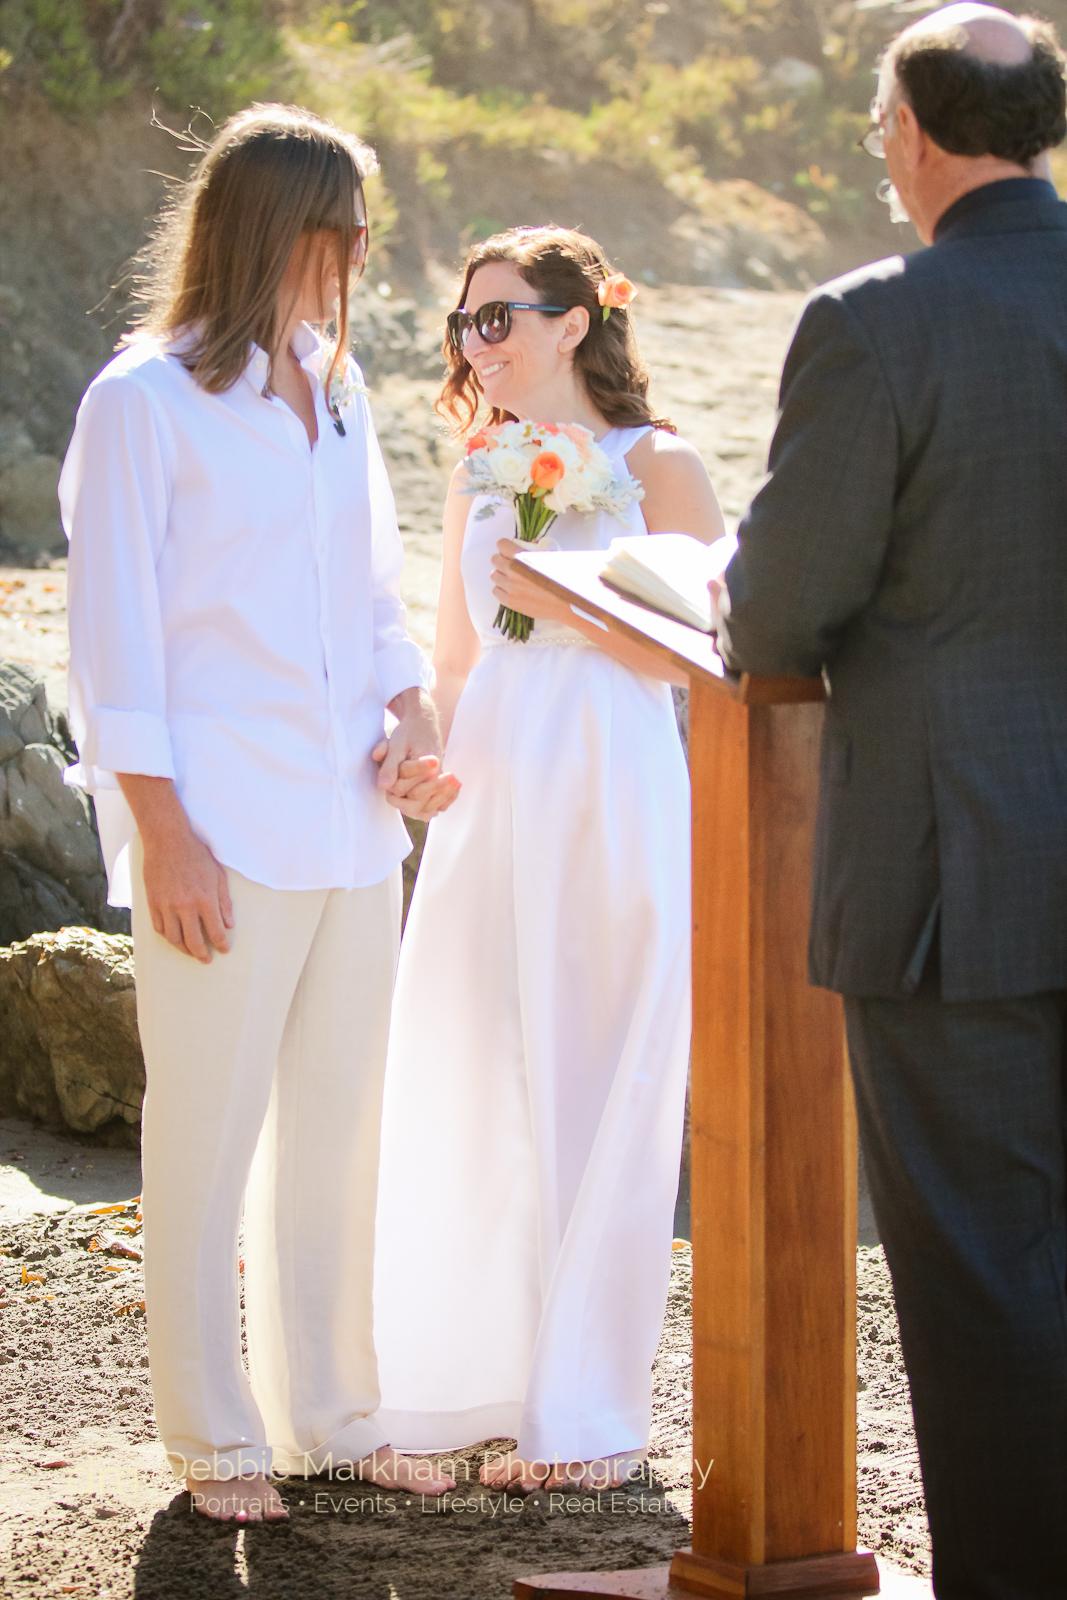 Debbie Markham Photography_Intimate Wedding_ Moonstone Beach_Wedding Photographer_Cambria_CA_Destination Wedding_Elopement-9372